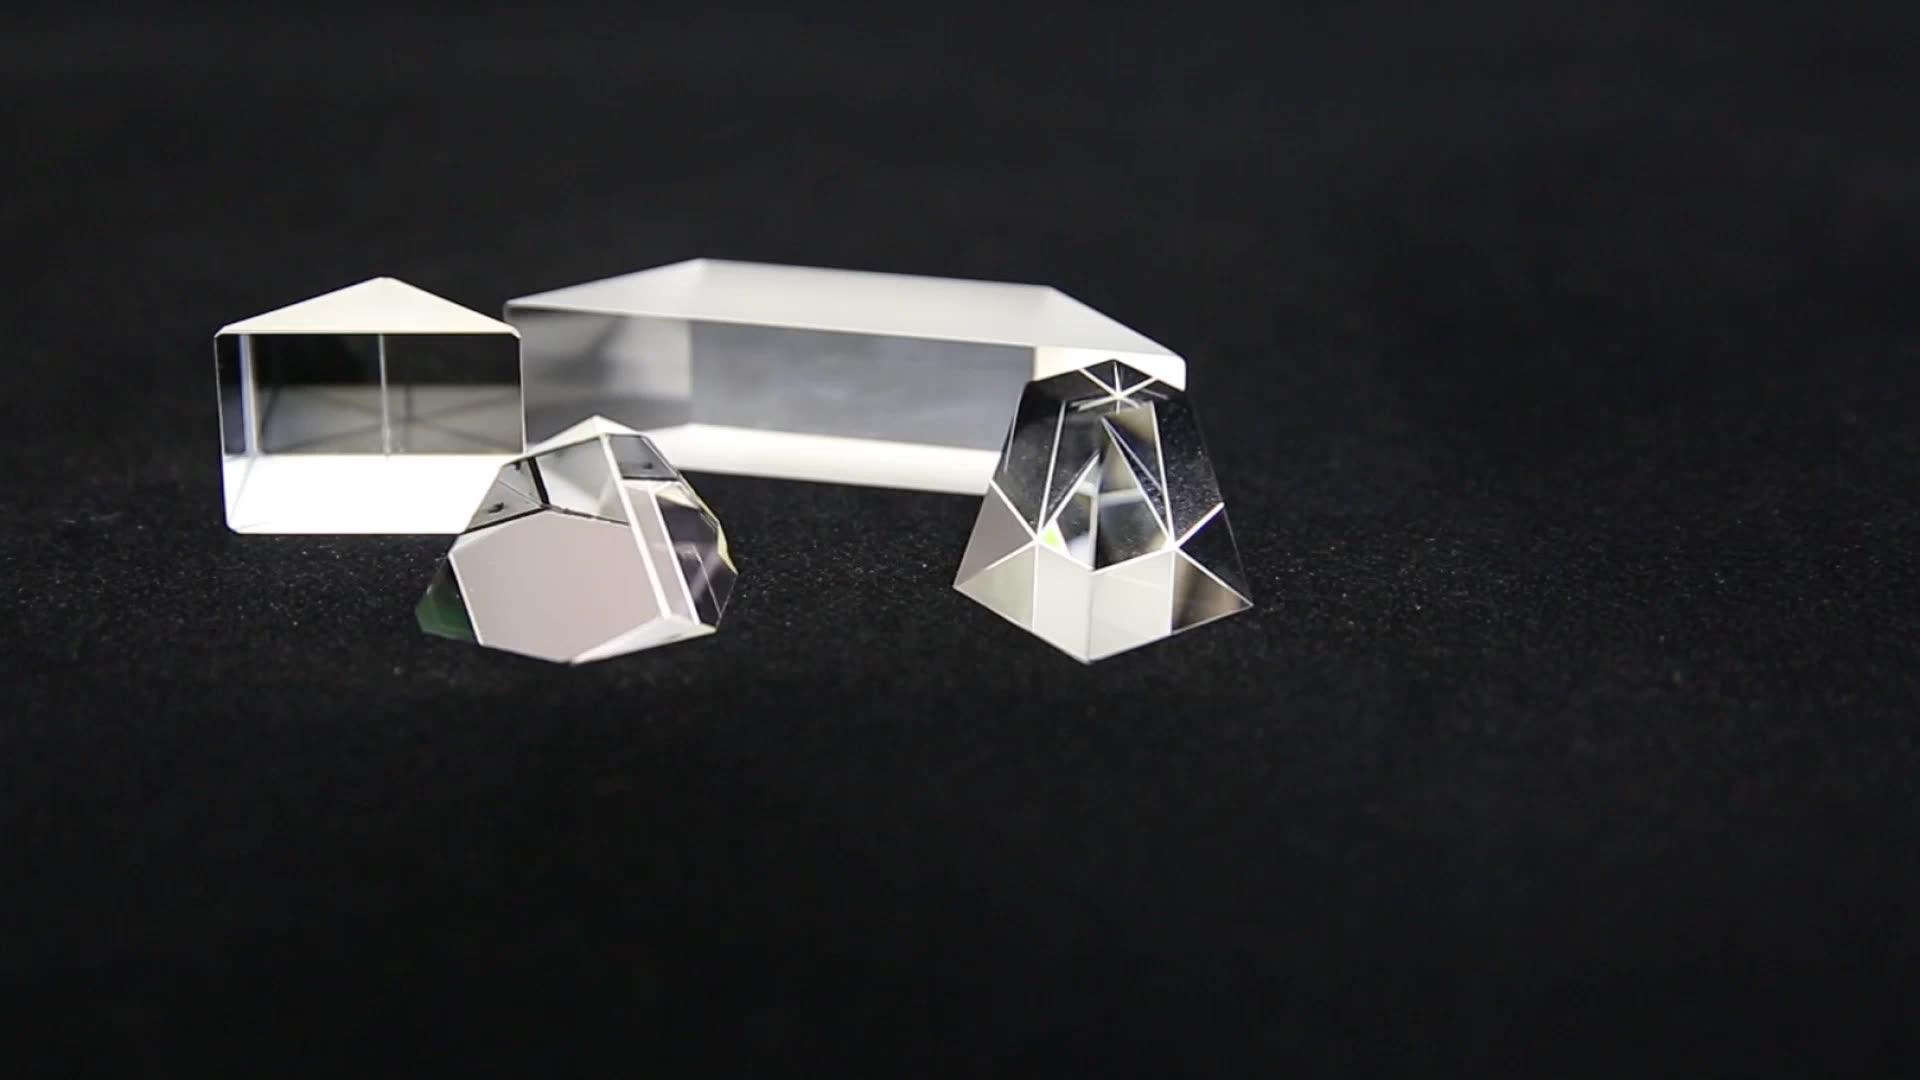 K9 Kaca Optik Pasokan Pabrik Gelas Dove Prisma dengan Lapisan AR